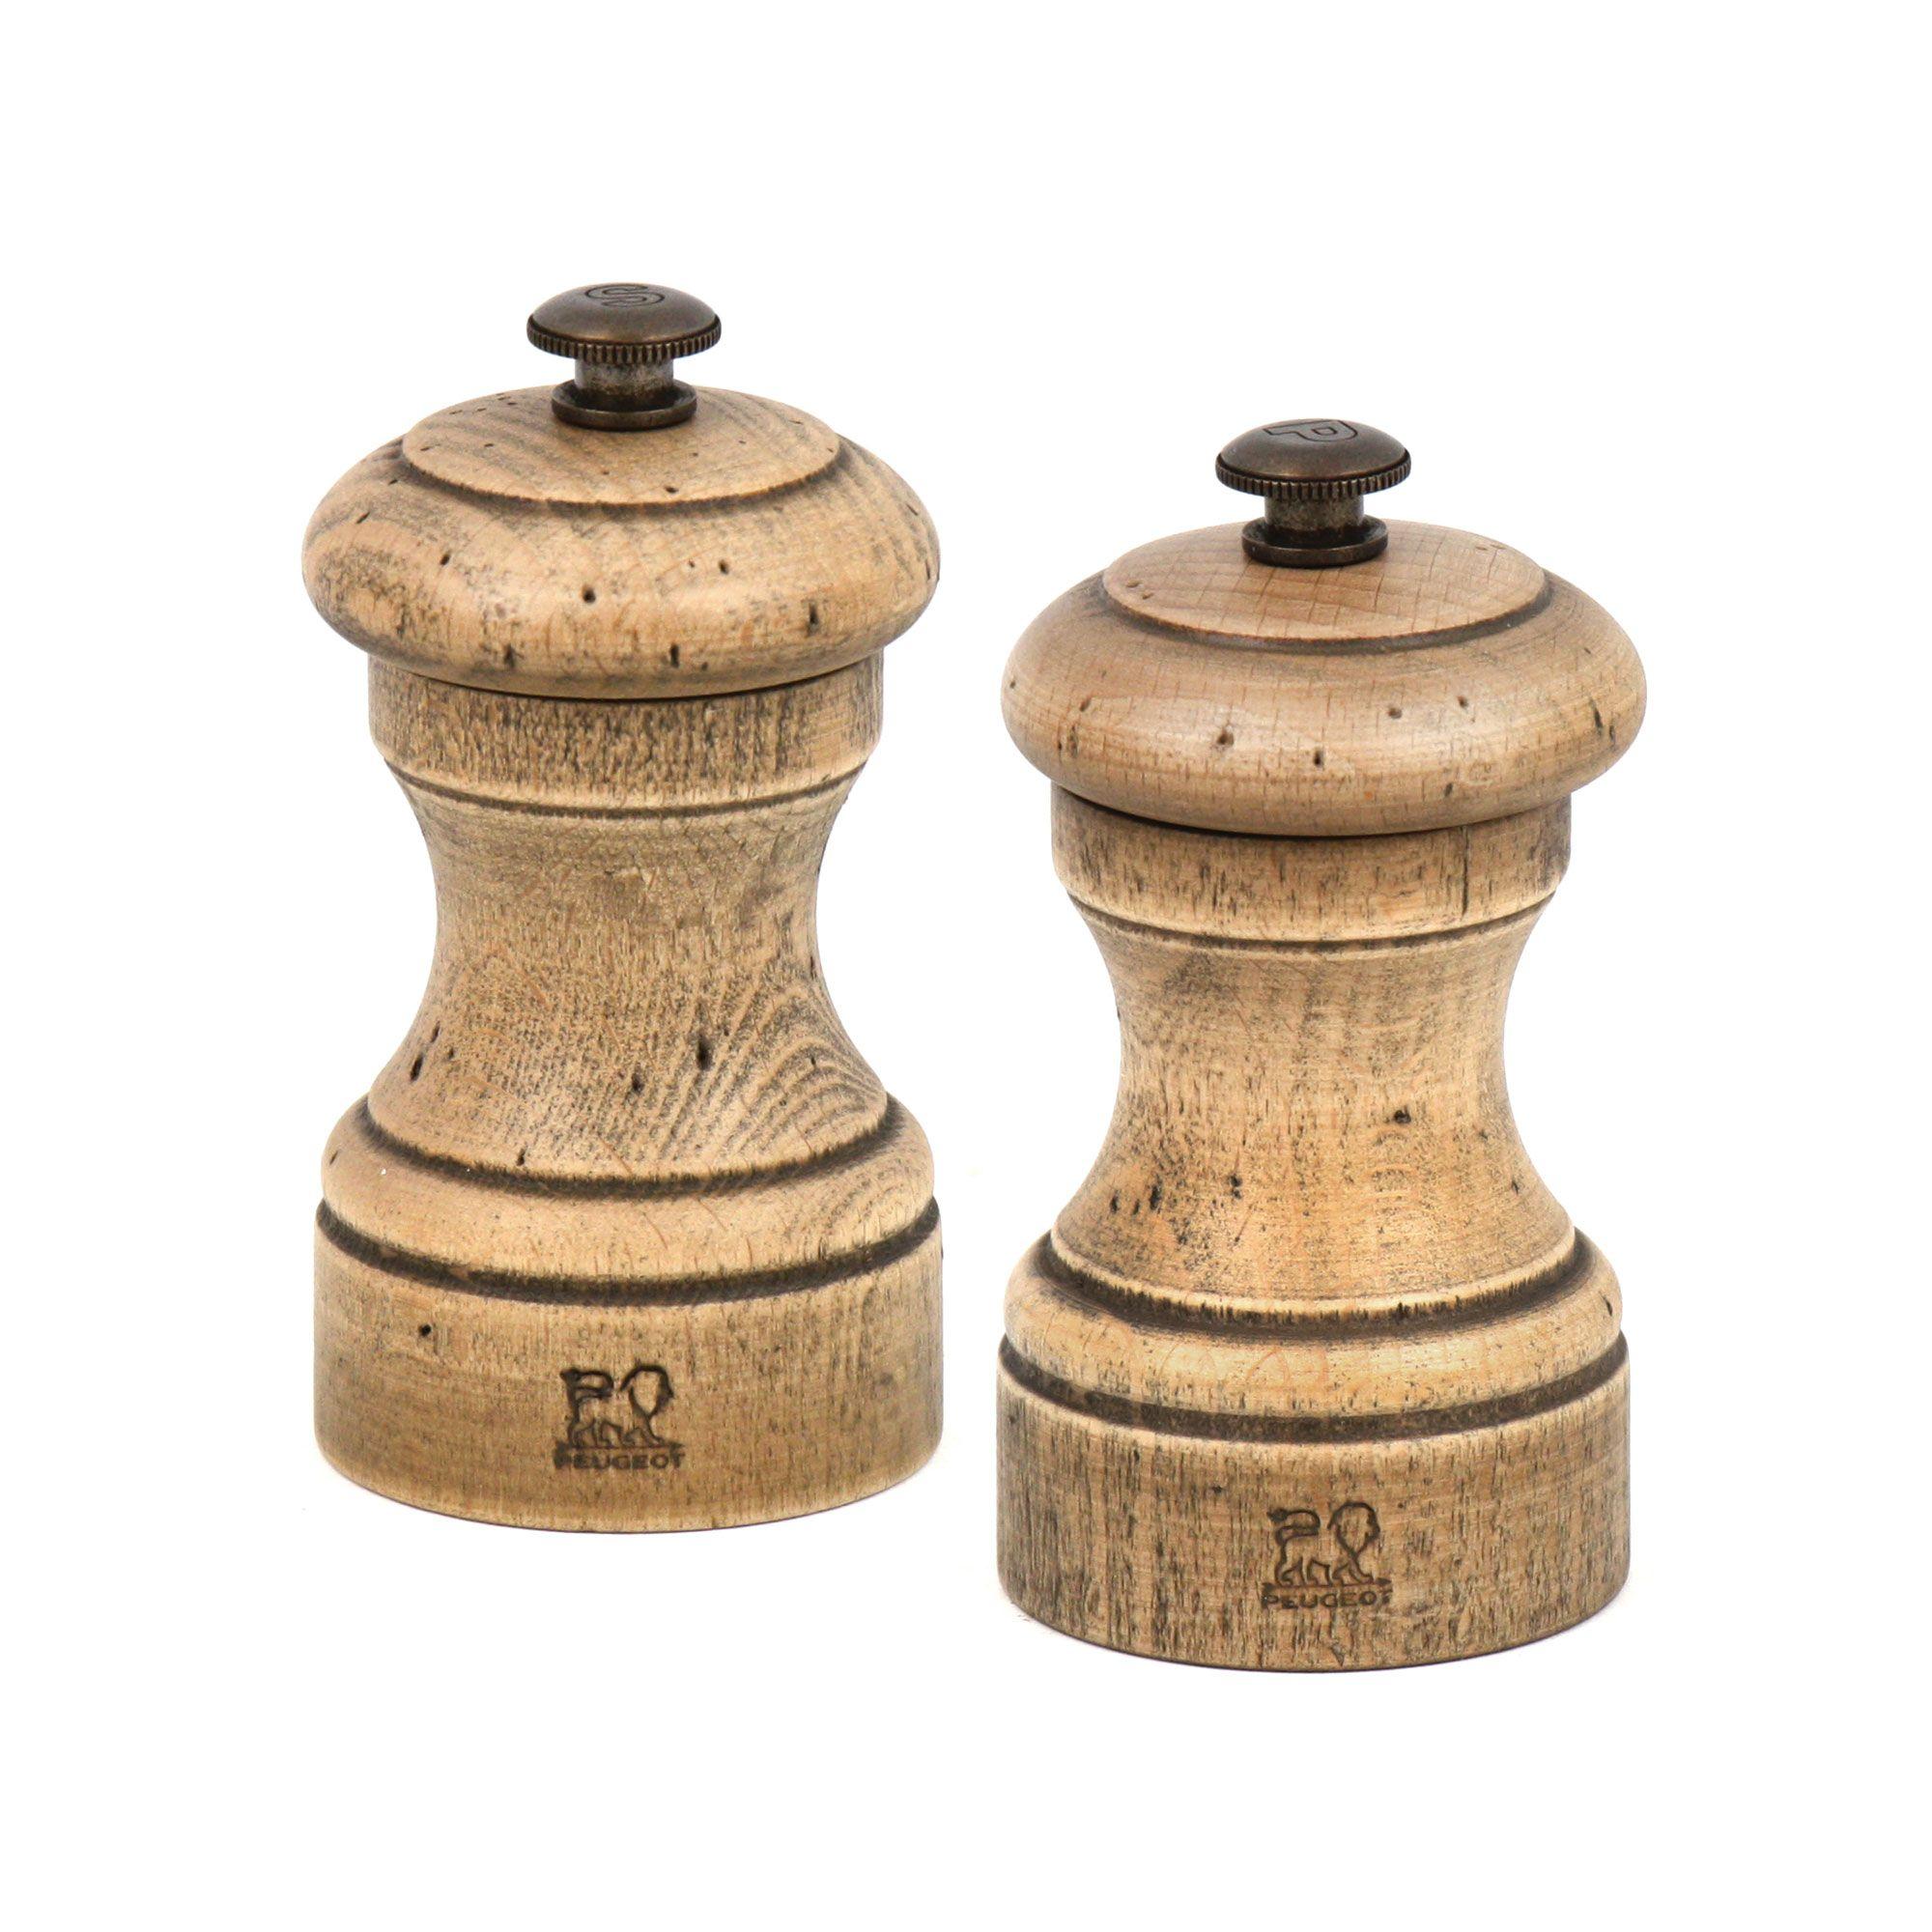 Peugeot Bistro Antique 4 Salt Pepper Mill Set Cutlery And More Pepper Mill Salt Pepper Mills Antique Collection